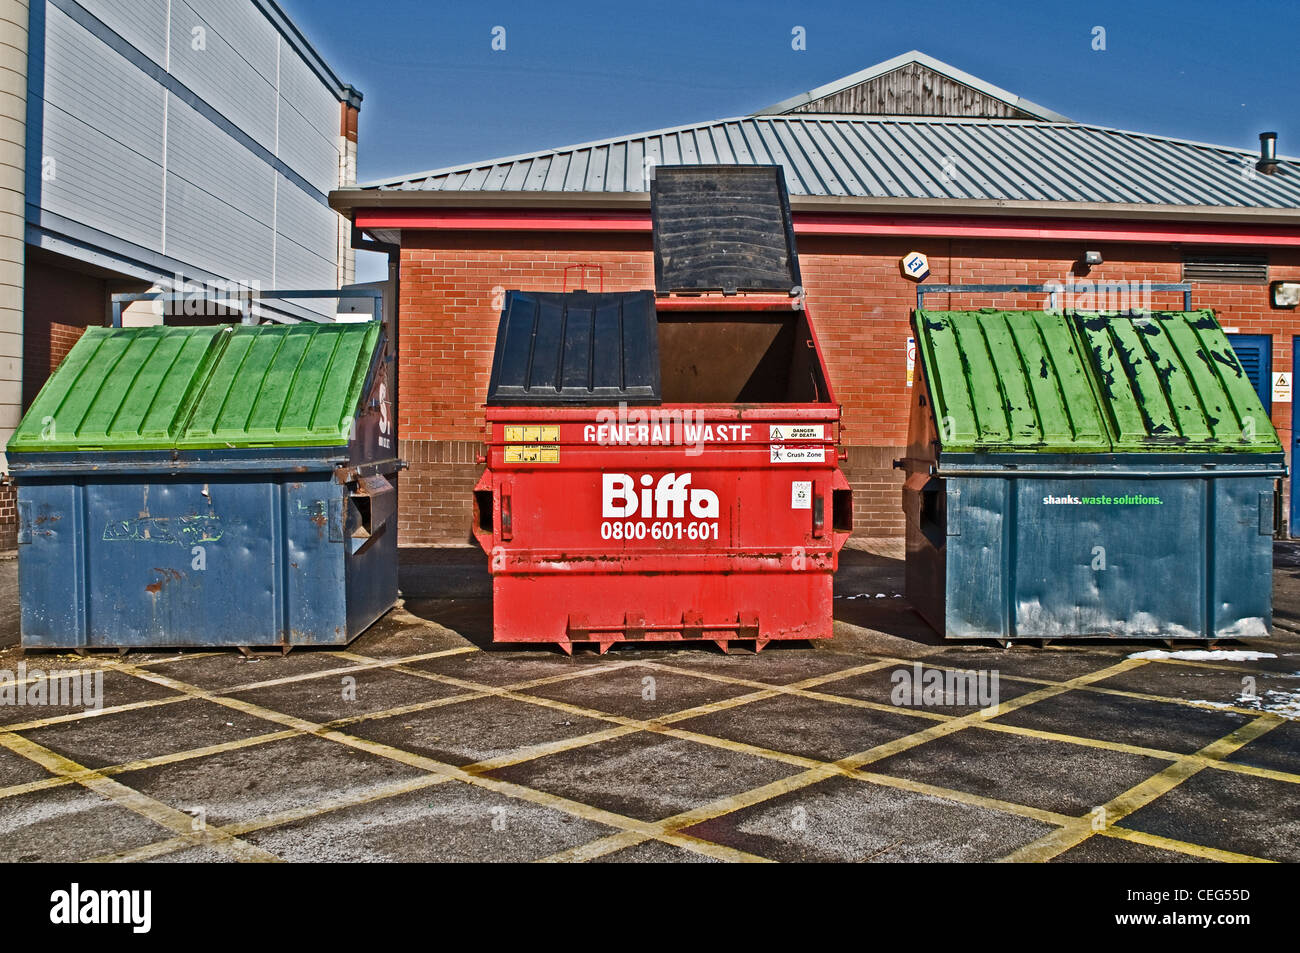 A 'Biffa' waste disposable skip, UK - Stock Image